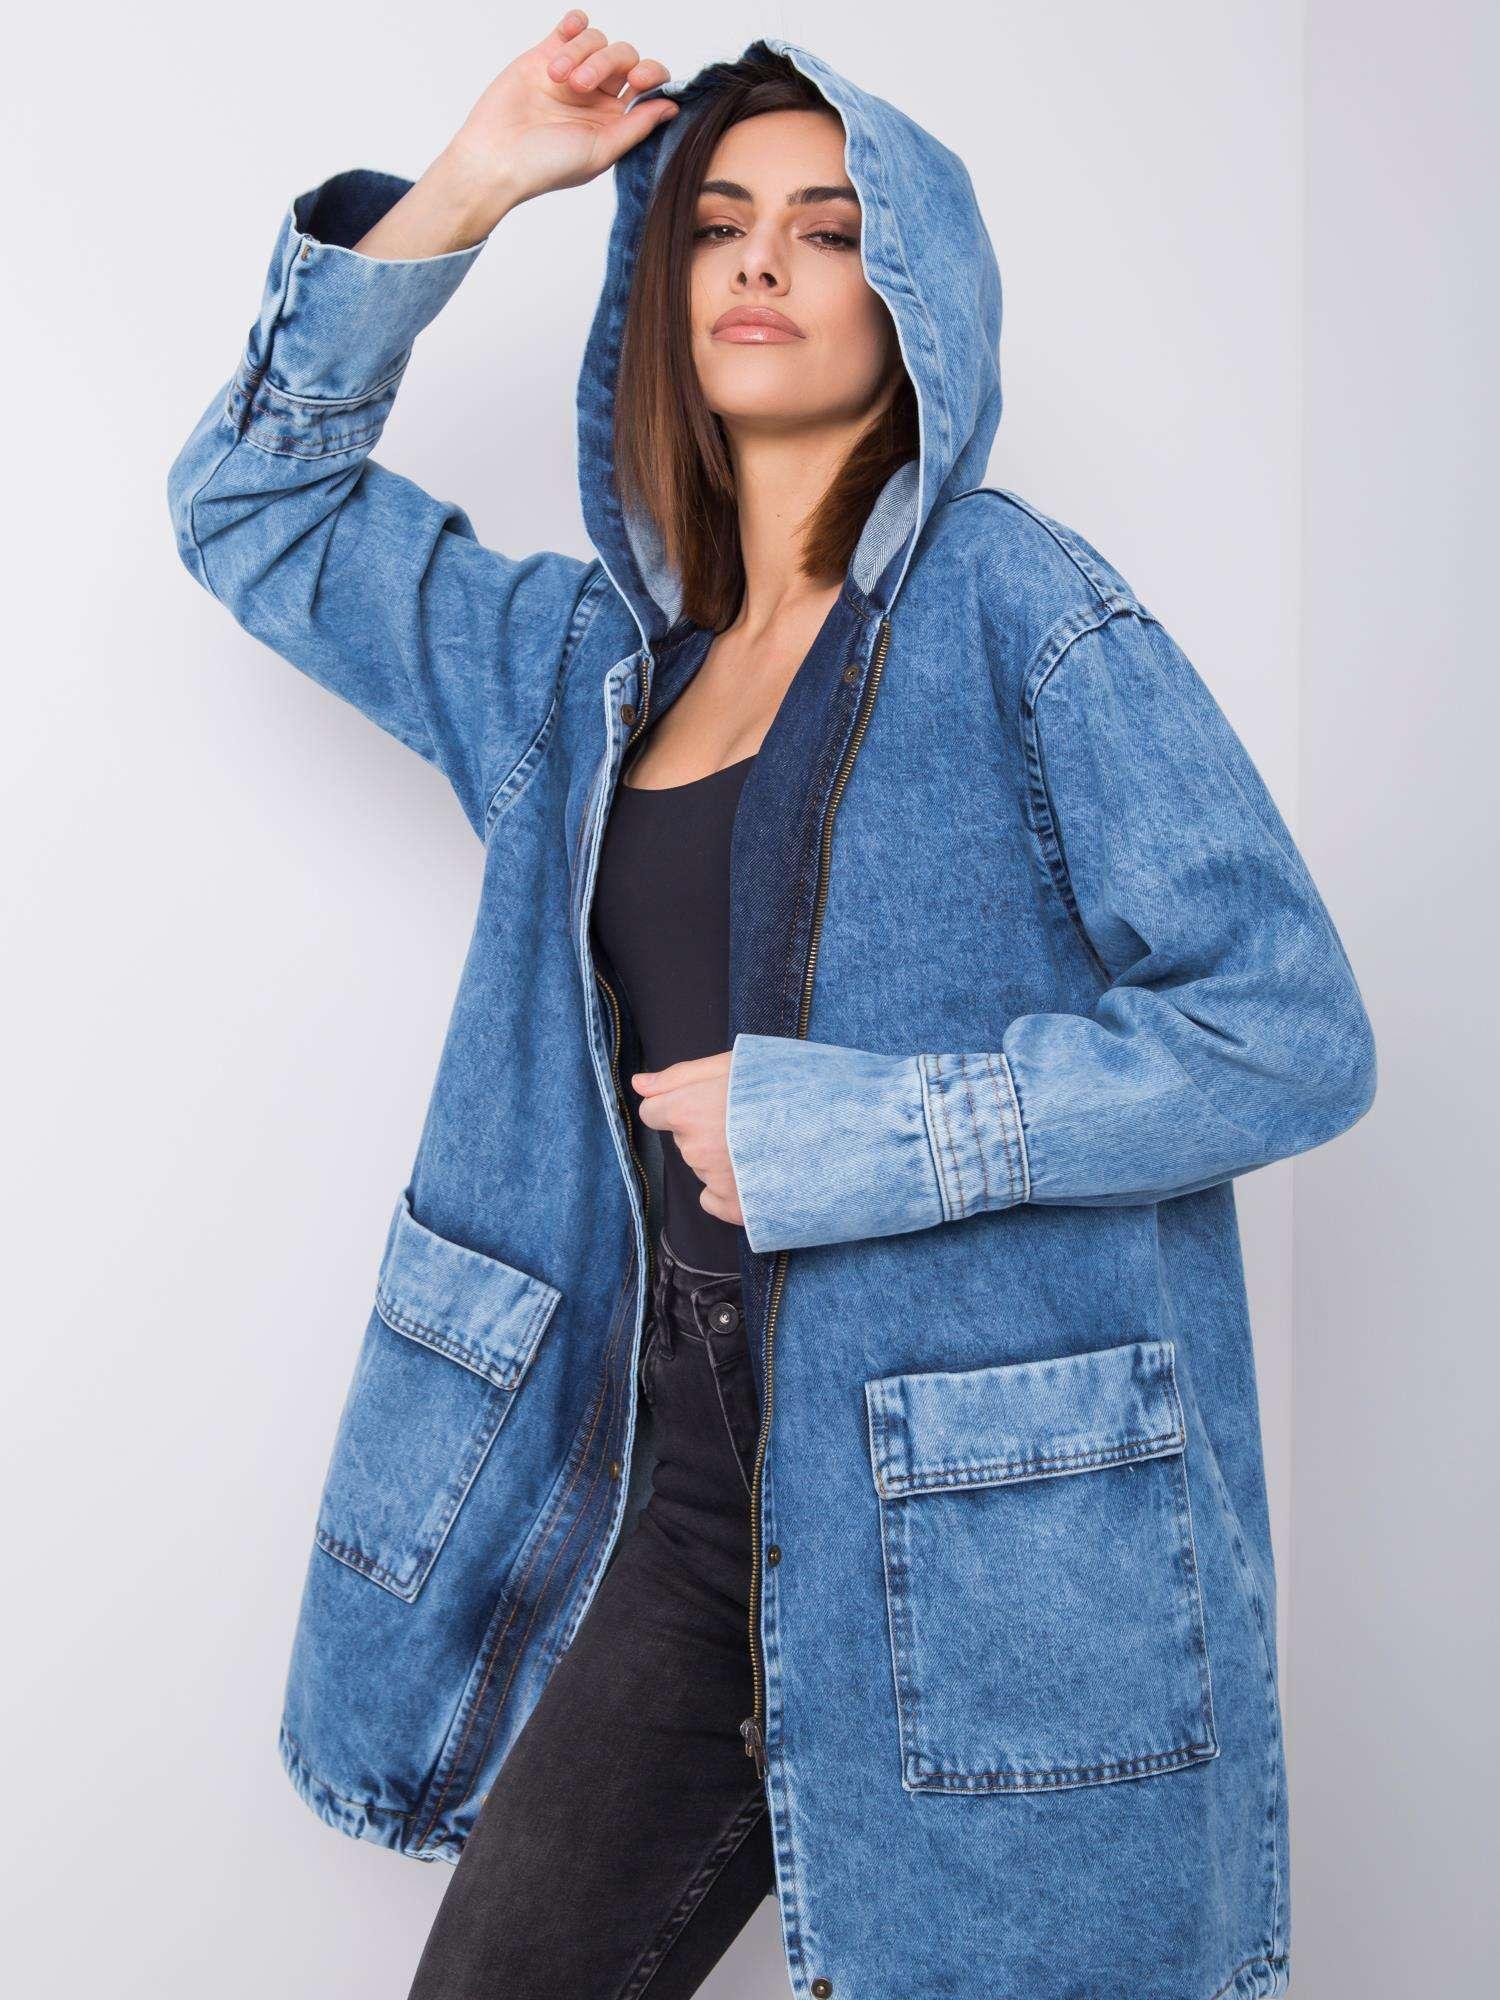 Modrá dlouhá džínová bunda s kapsami -339-KR-C2222-1.08P-denim blue Velikost: S